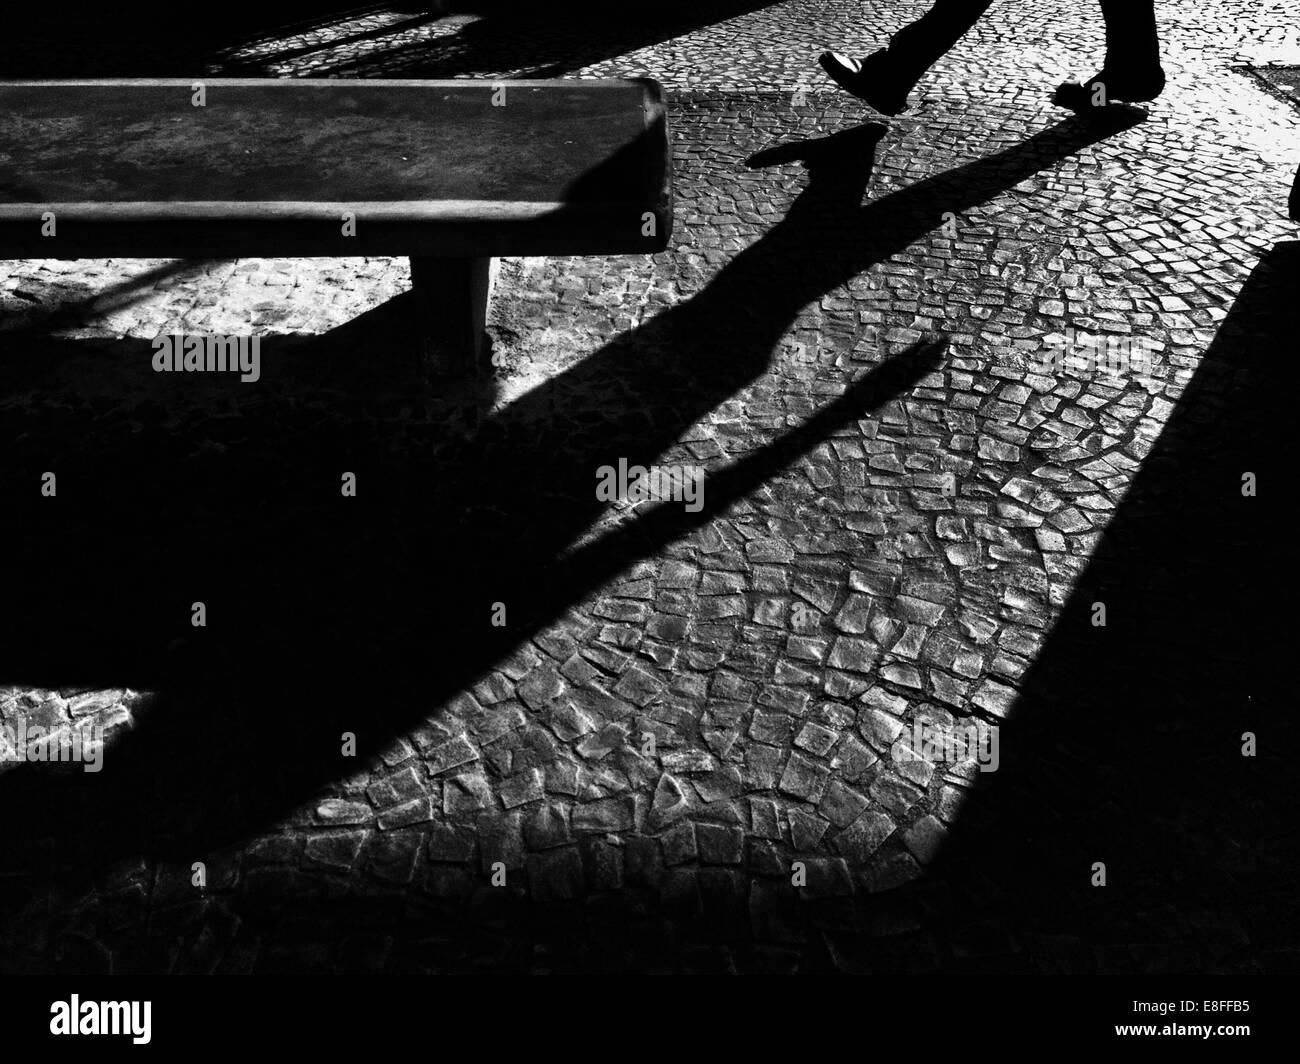 Shadow of man on street - Stock Image